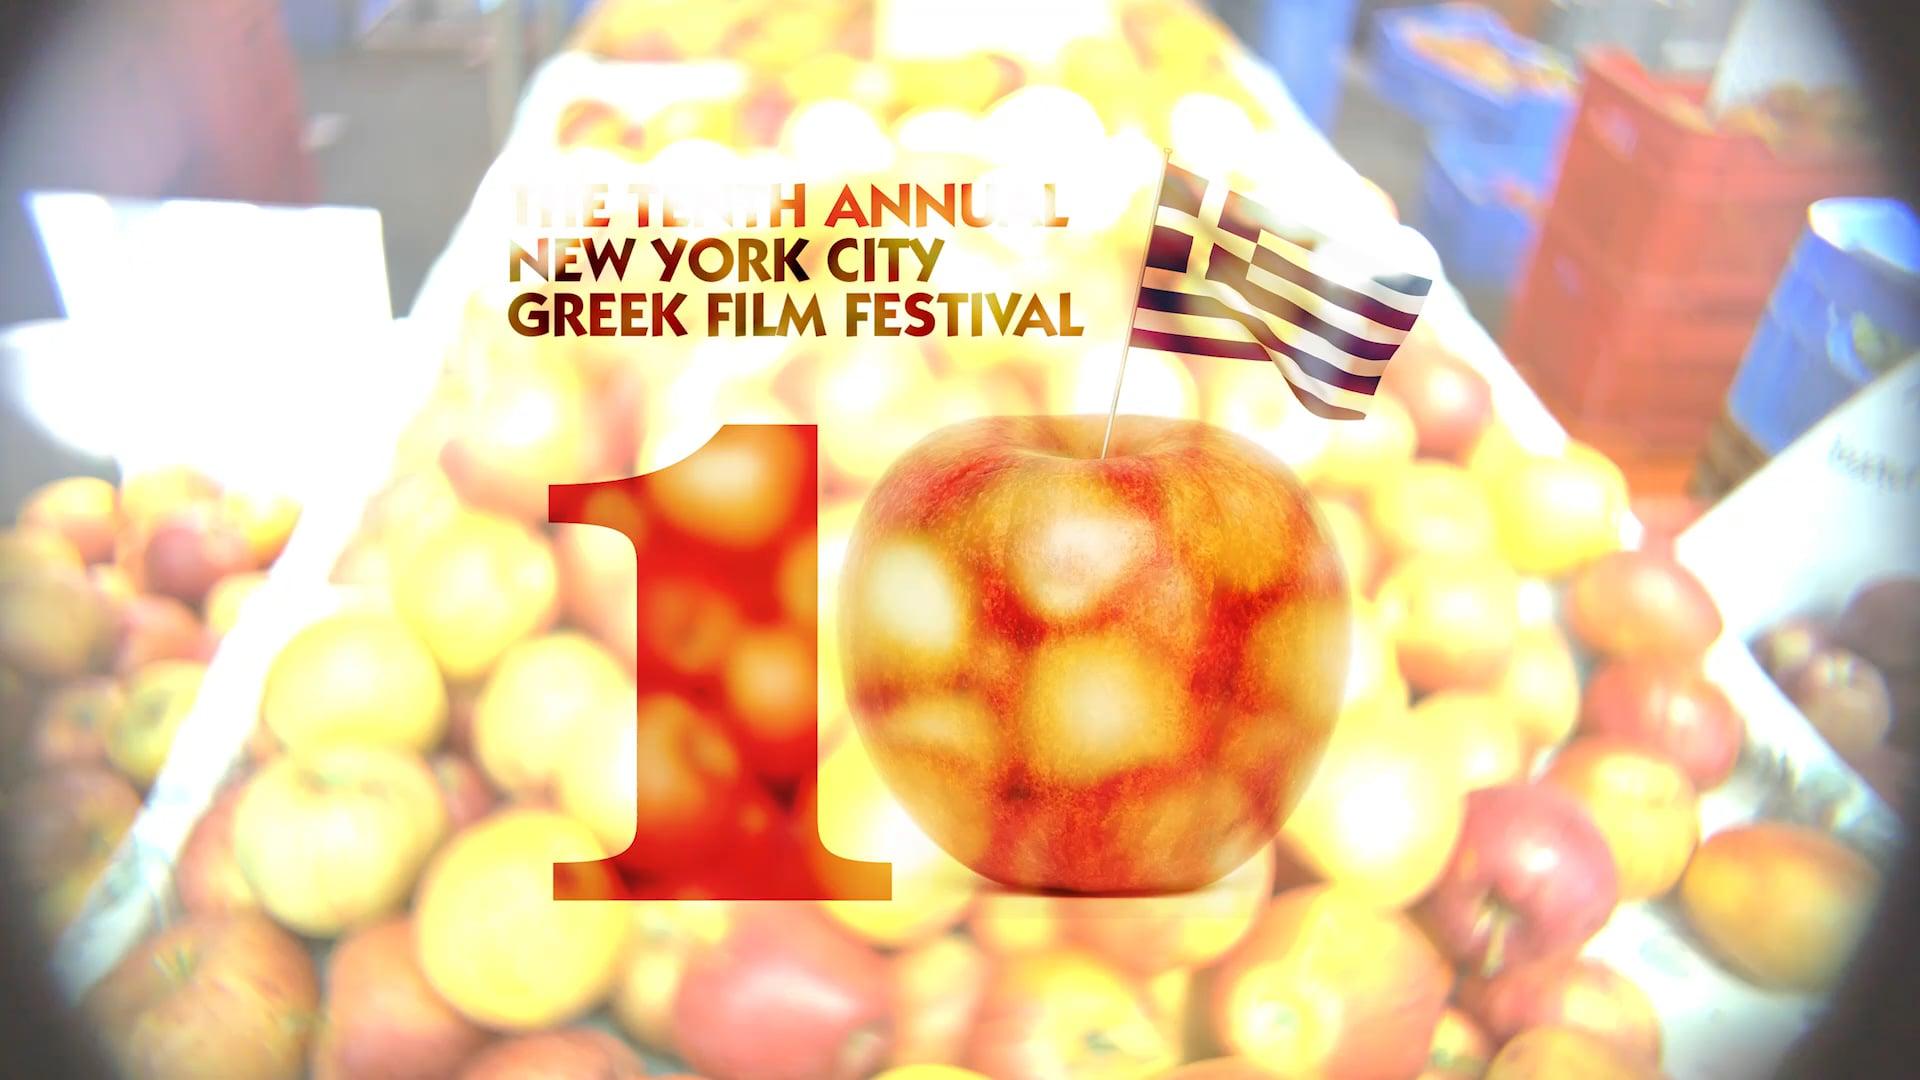 10th Anniversary NYC Greek Film Festival 2016